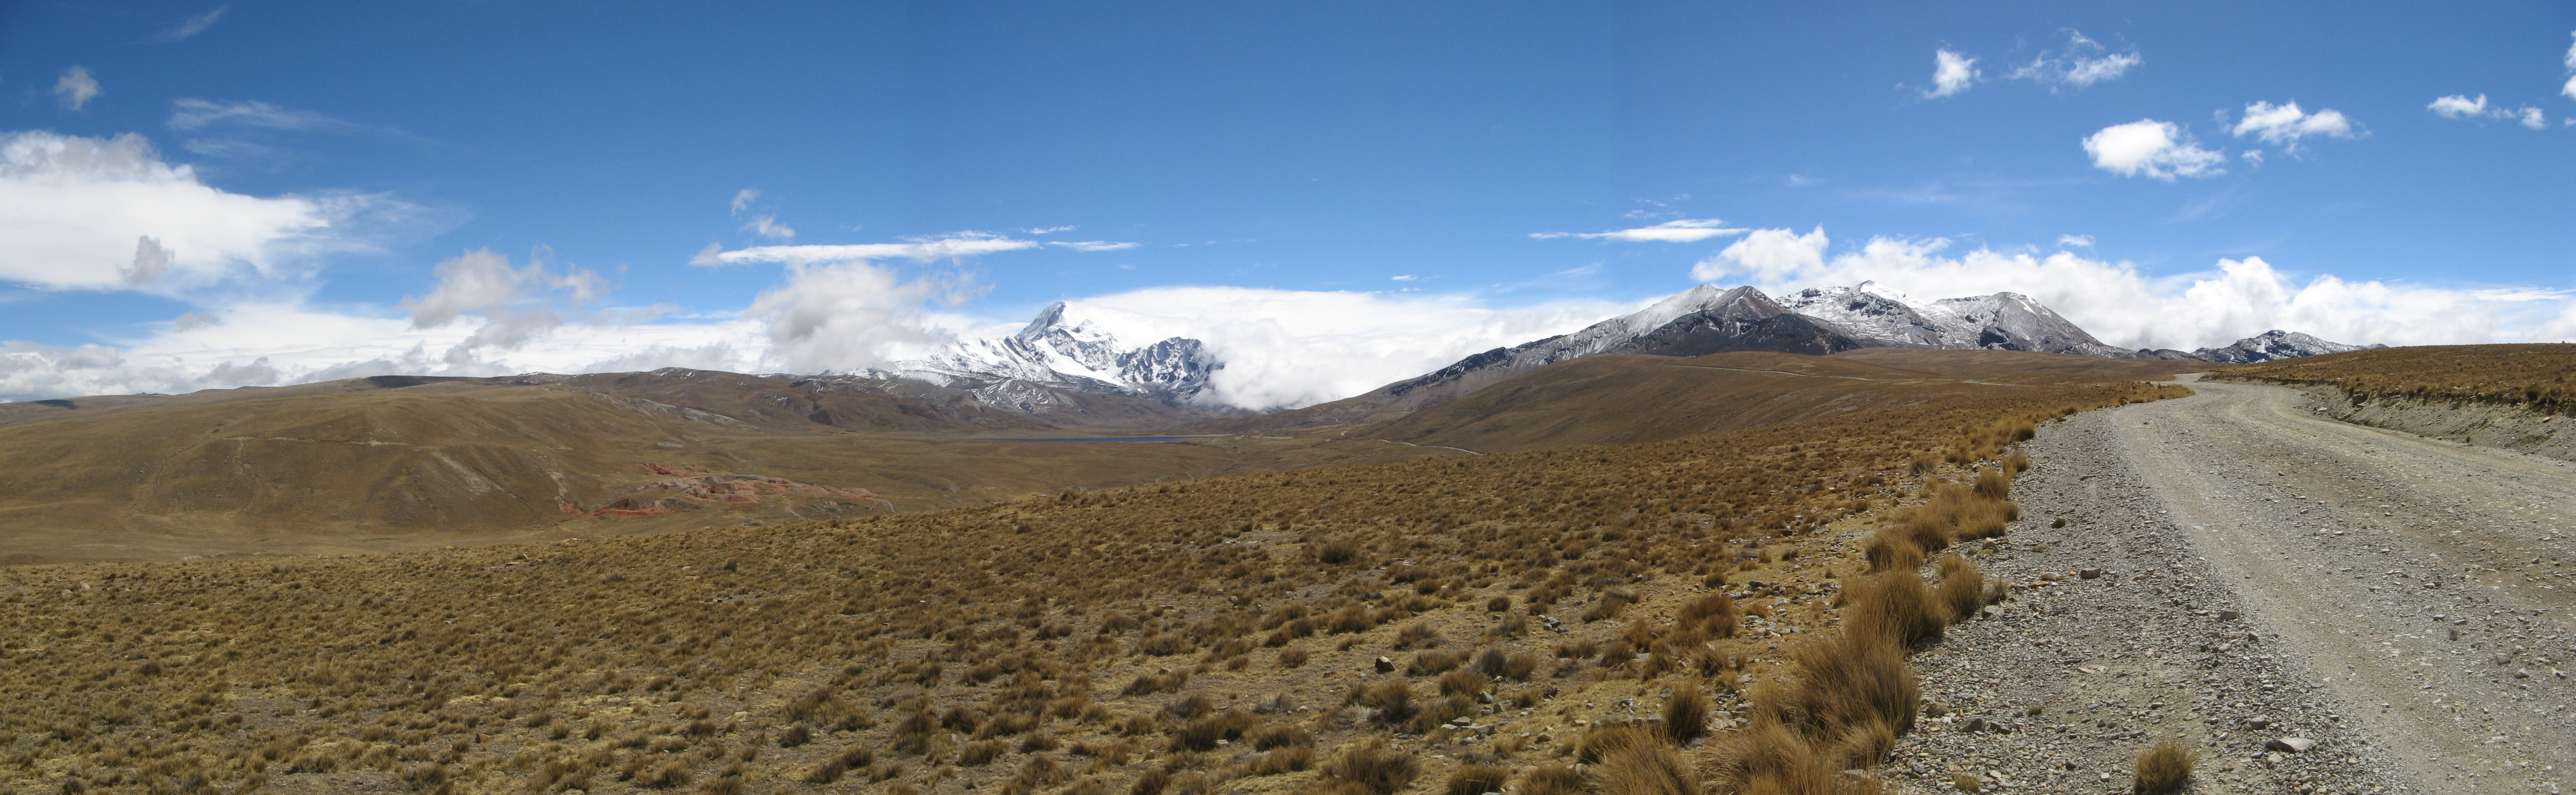 Panorama Chacaltaya 2